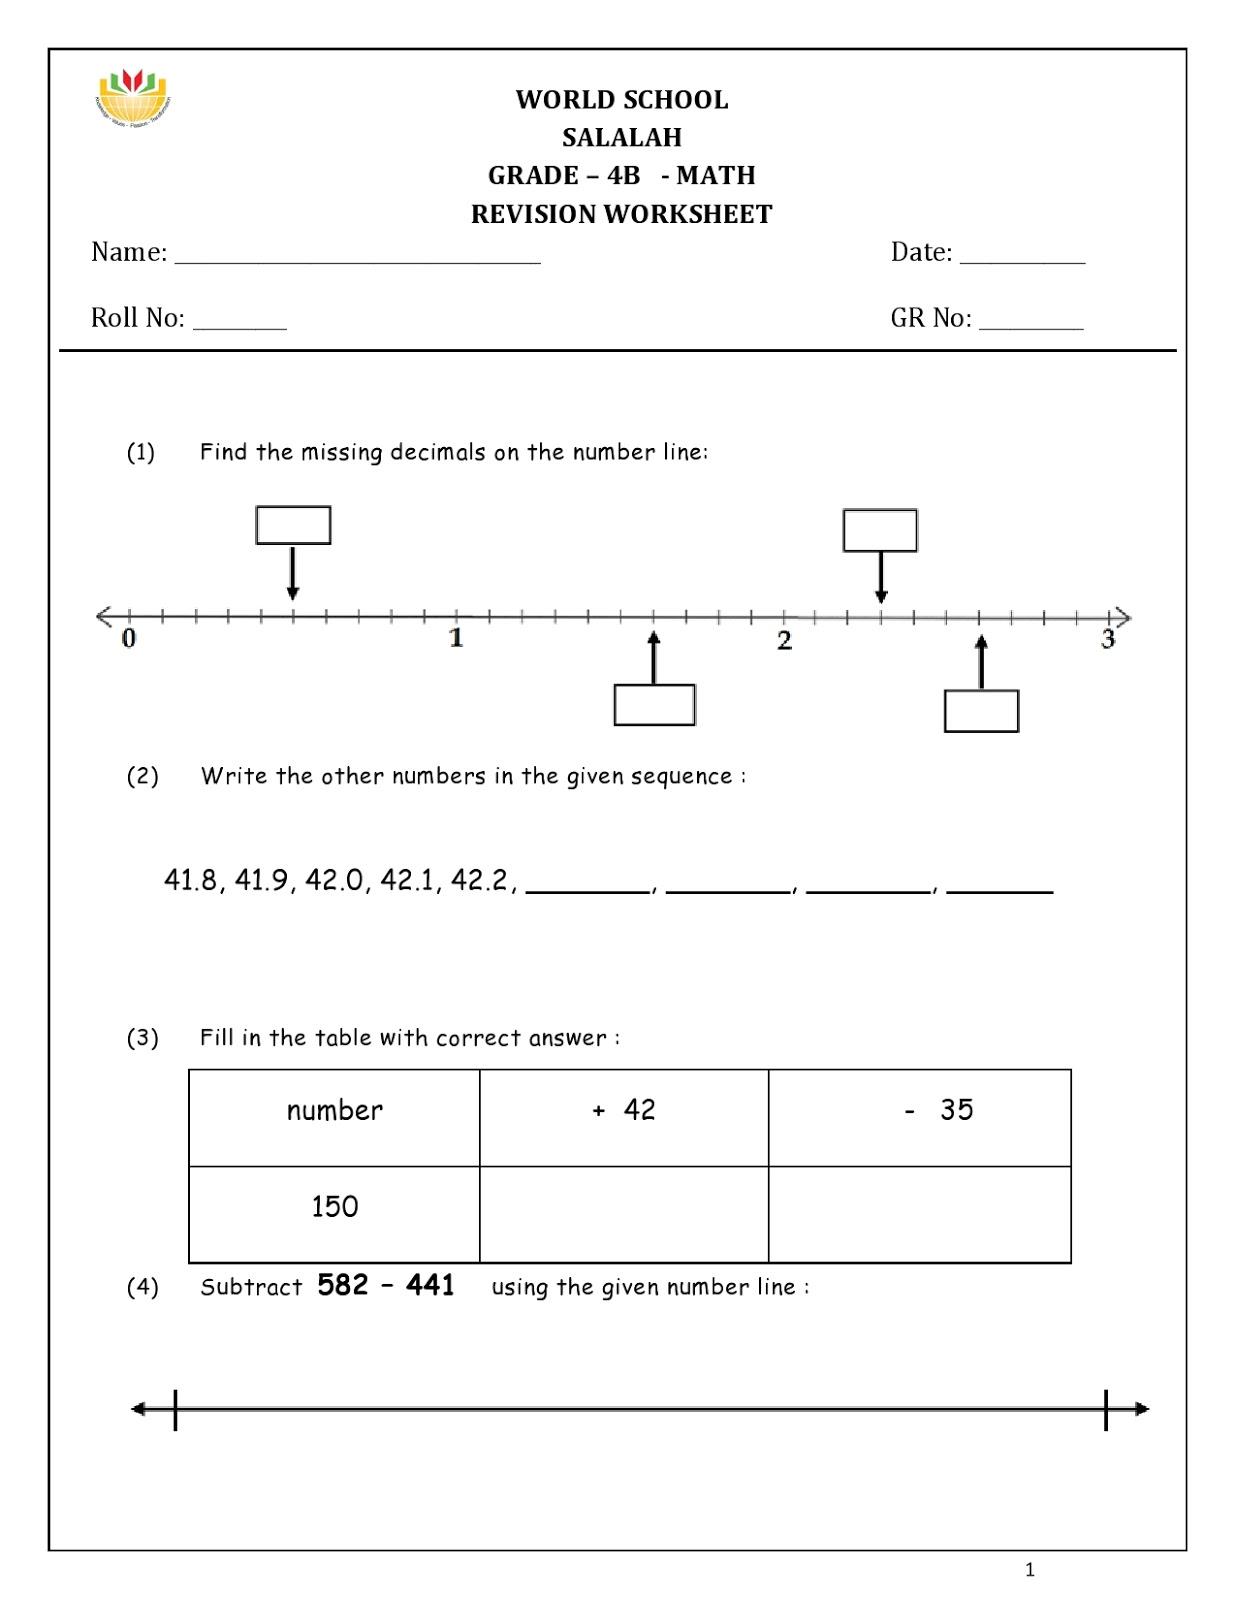 Birla World School Oman Homework For Grade 4 As On 07 12